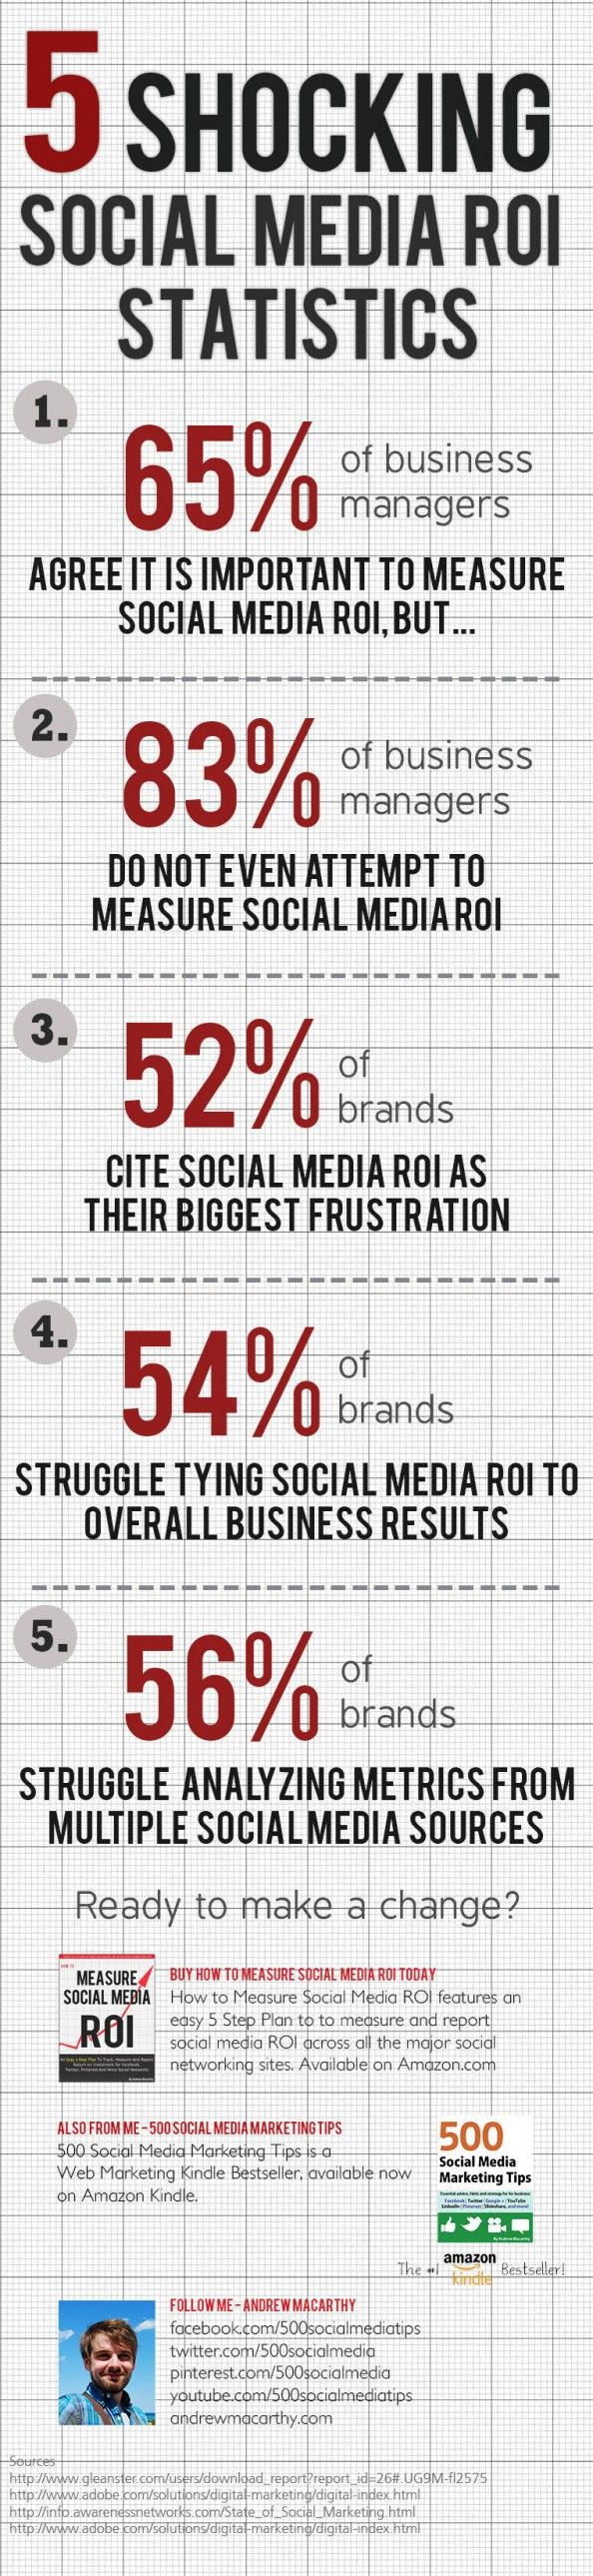 5 Shocking Social Media ROI Statistics Infographic